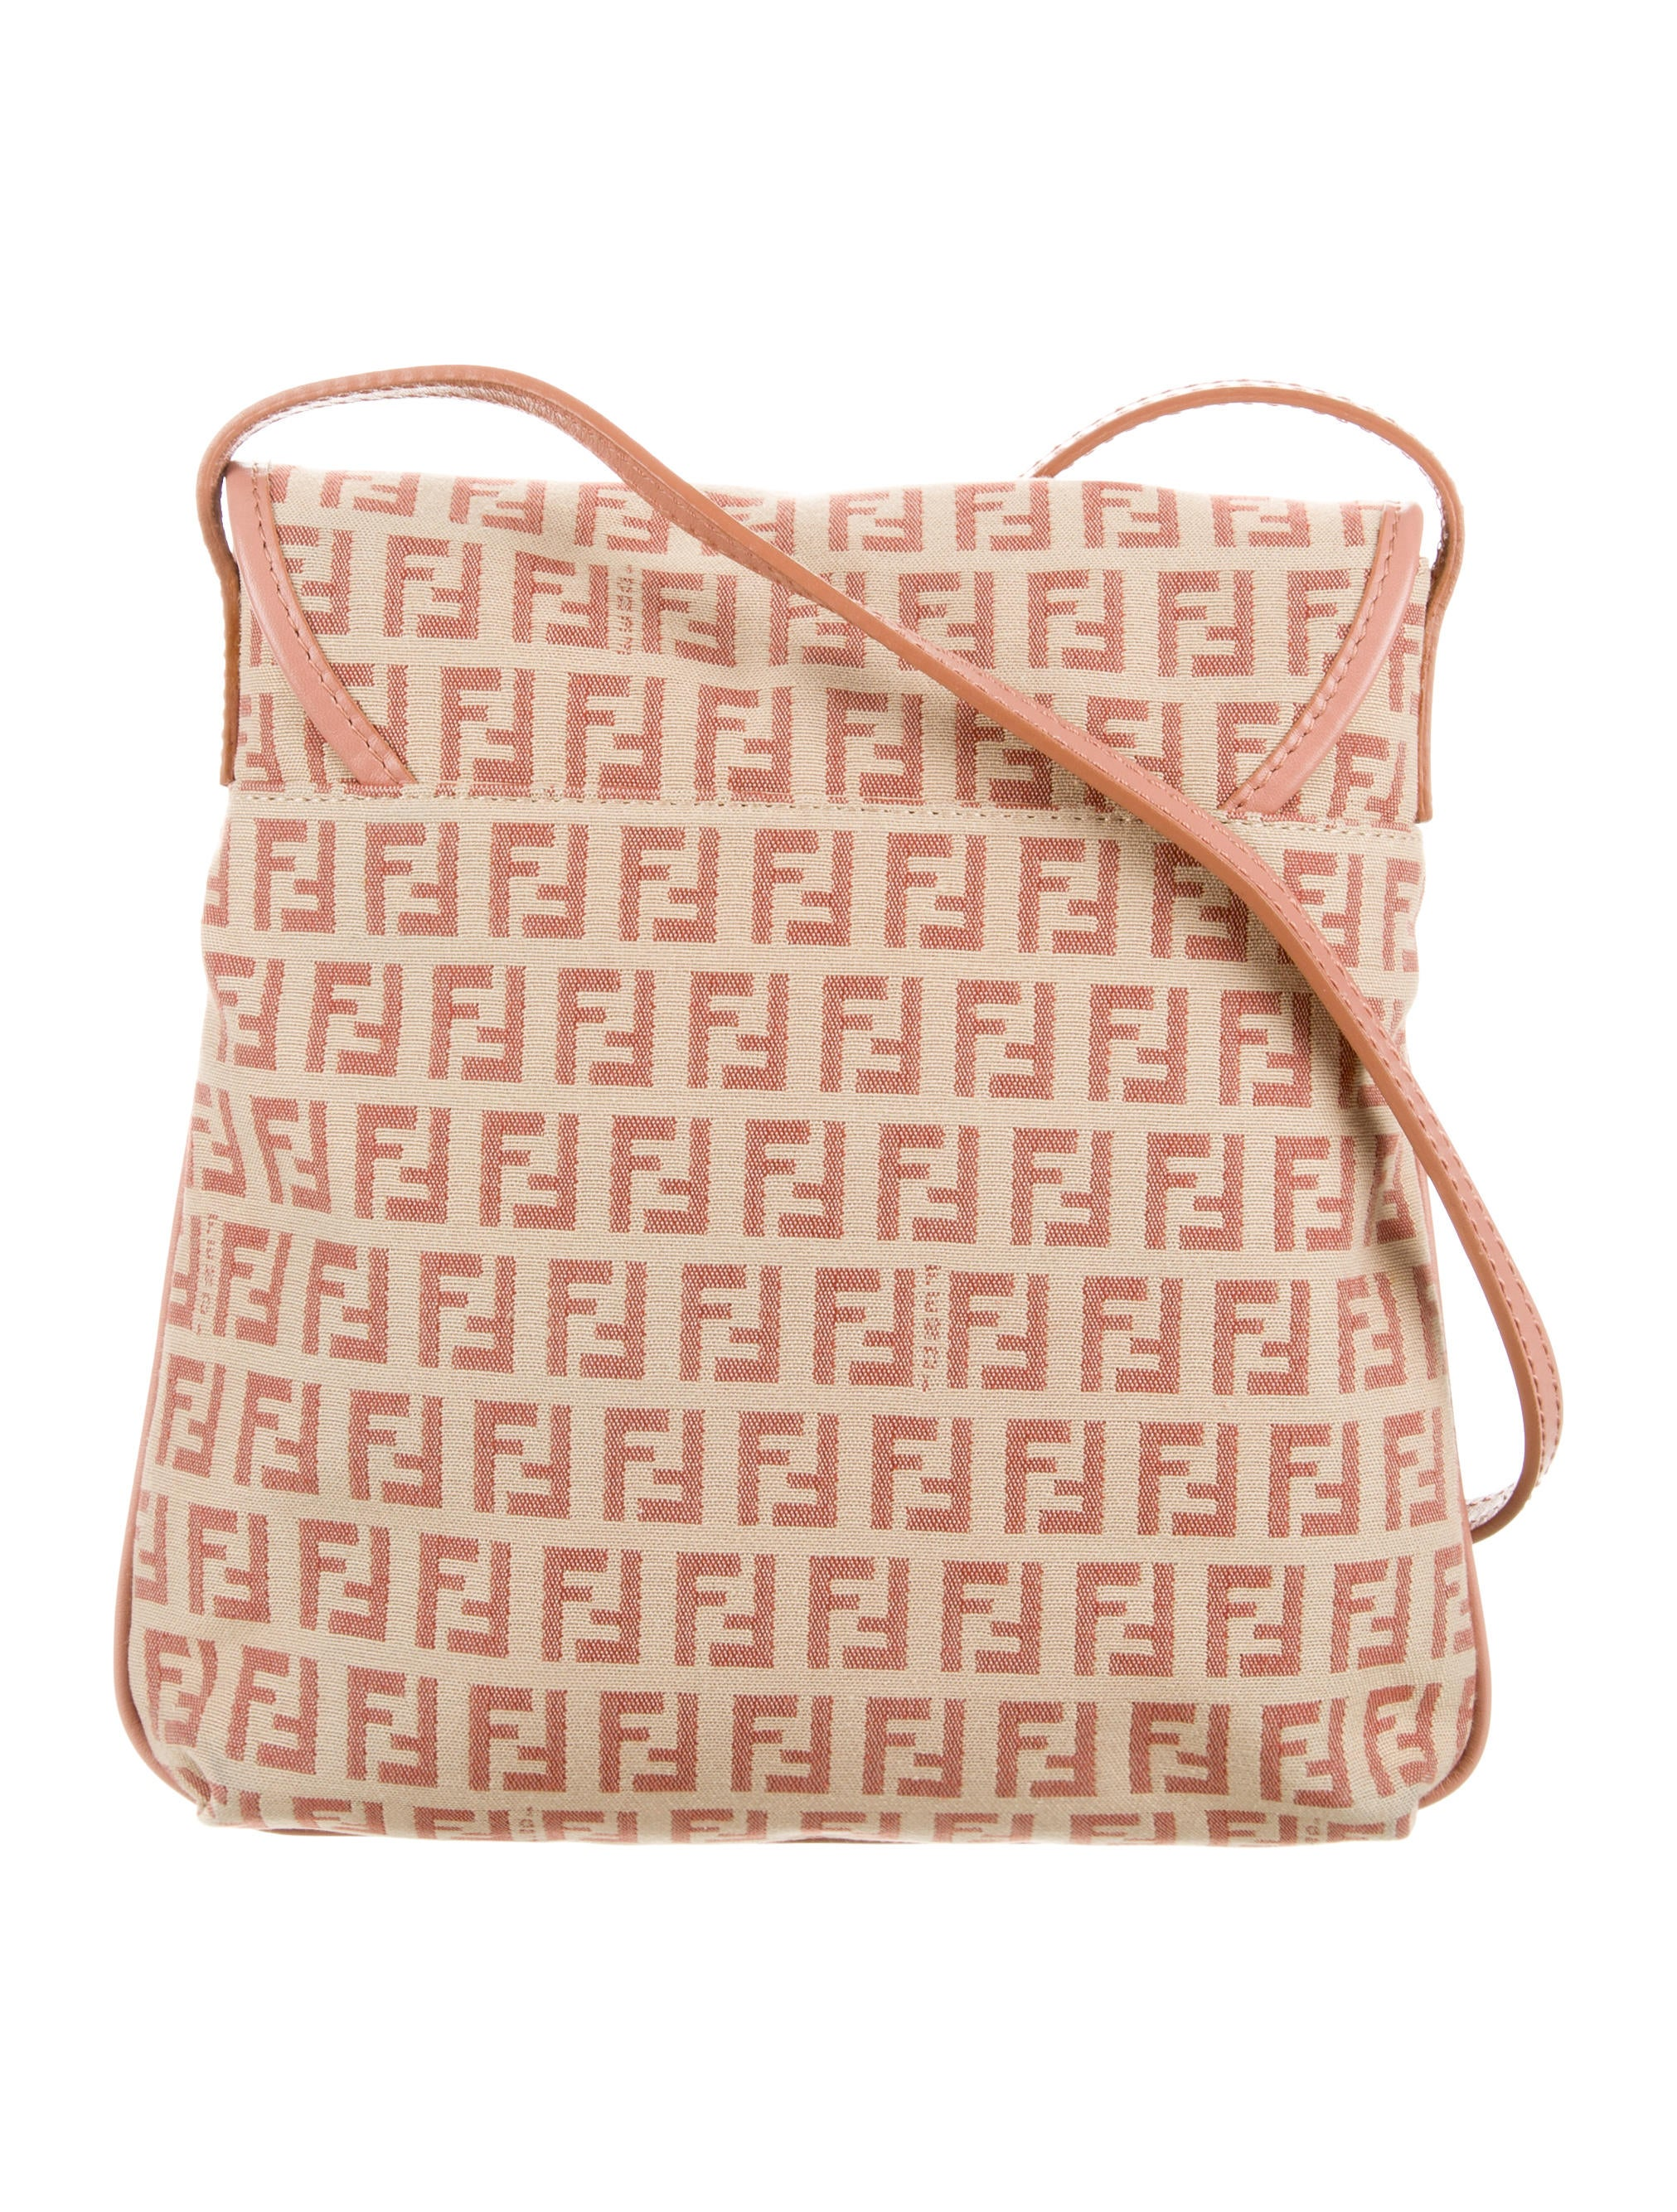 Fendi Zucchino Messenger Bag - Handbags - FEN38344  6954642ce9c04